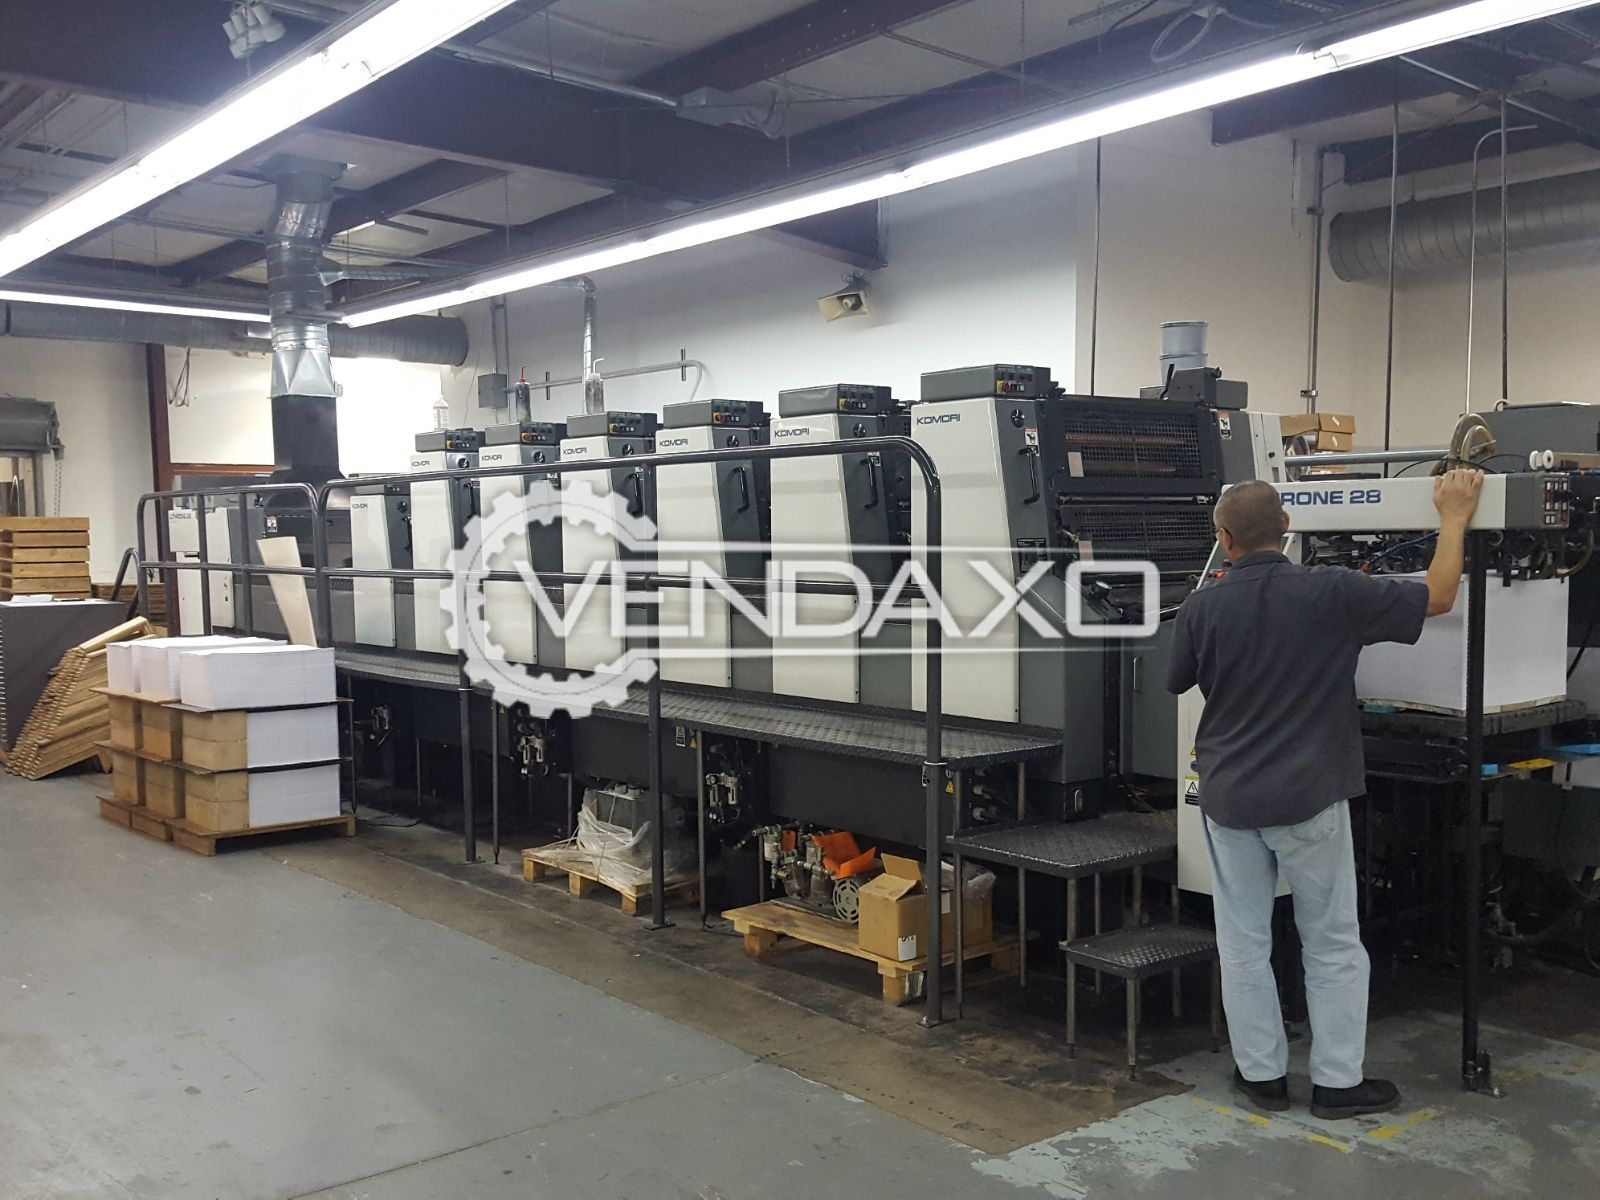 KOMORI LITHRONE 628 Offset Printing Machine - 20 x 28 Inch, 6 Color